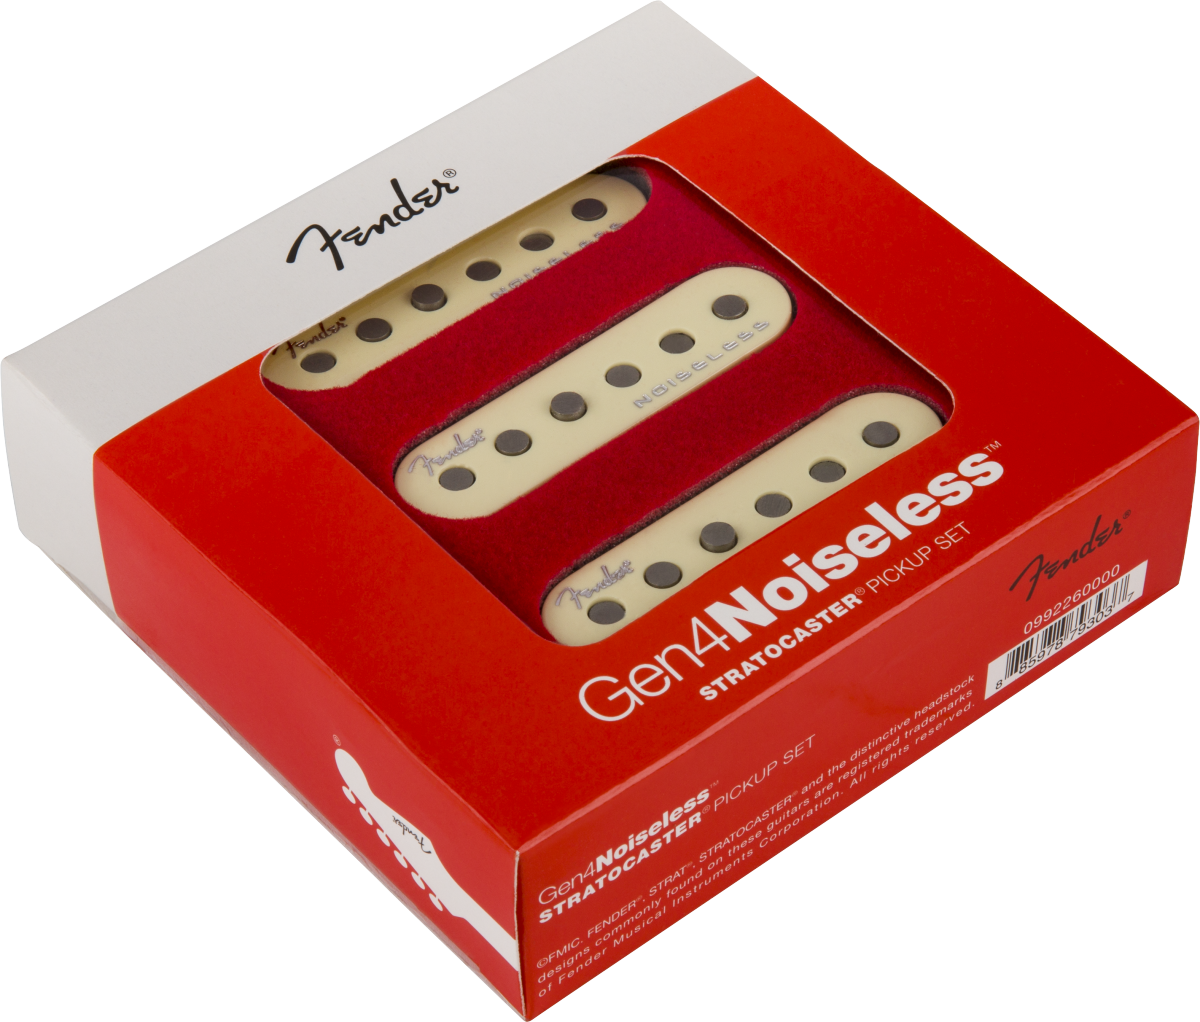 FENDER-Gen-4-Noiseless-Stratocaster-Pickups-Set-of-3-sku-571000746